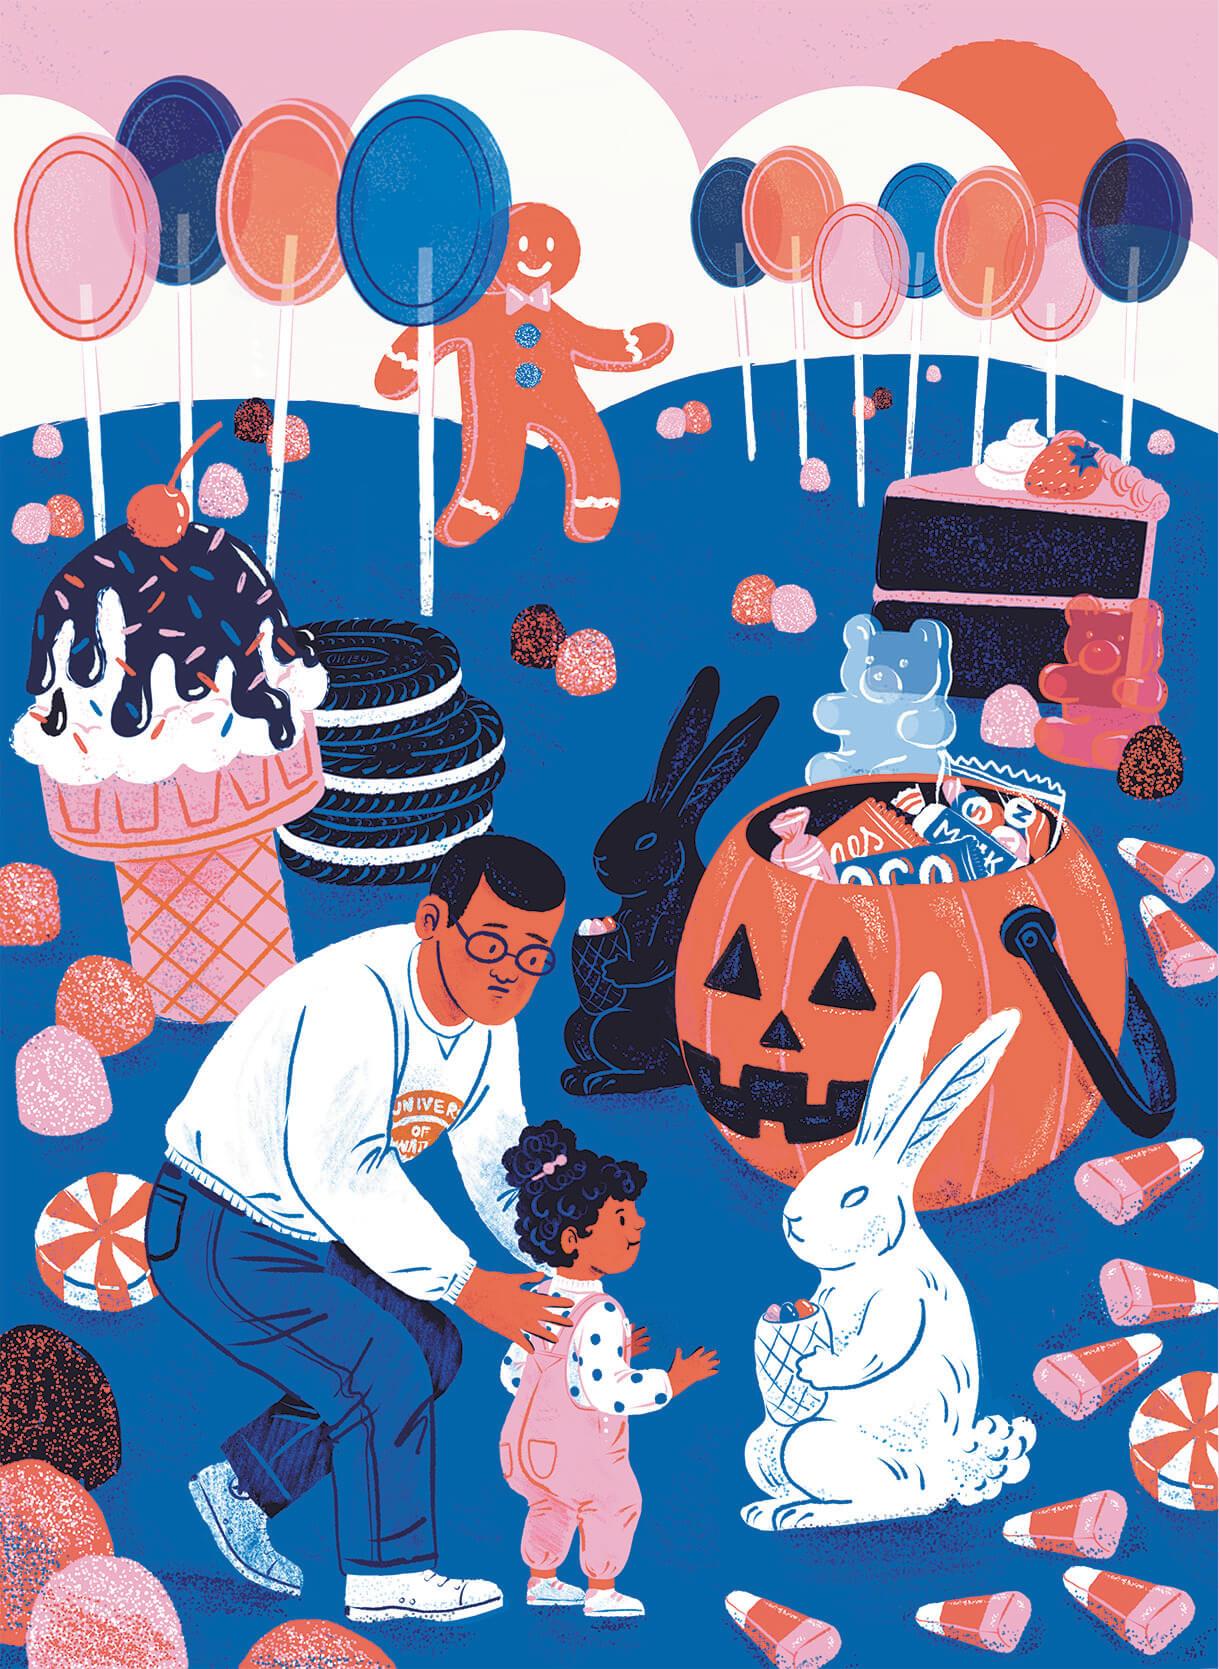 Illustration by Salini Perara